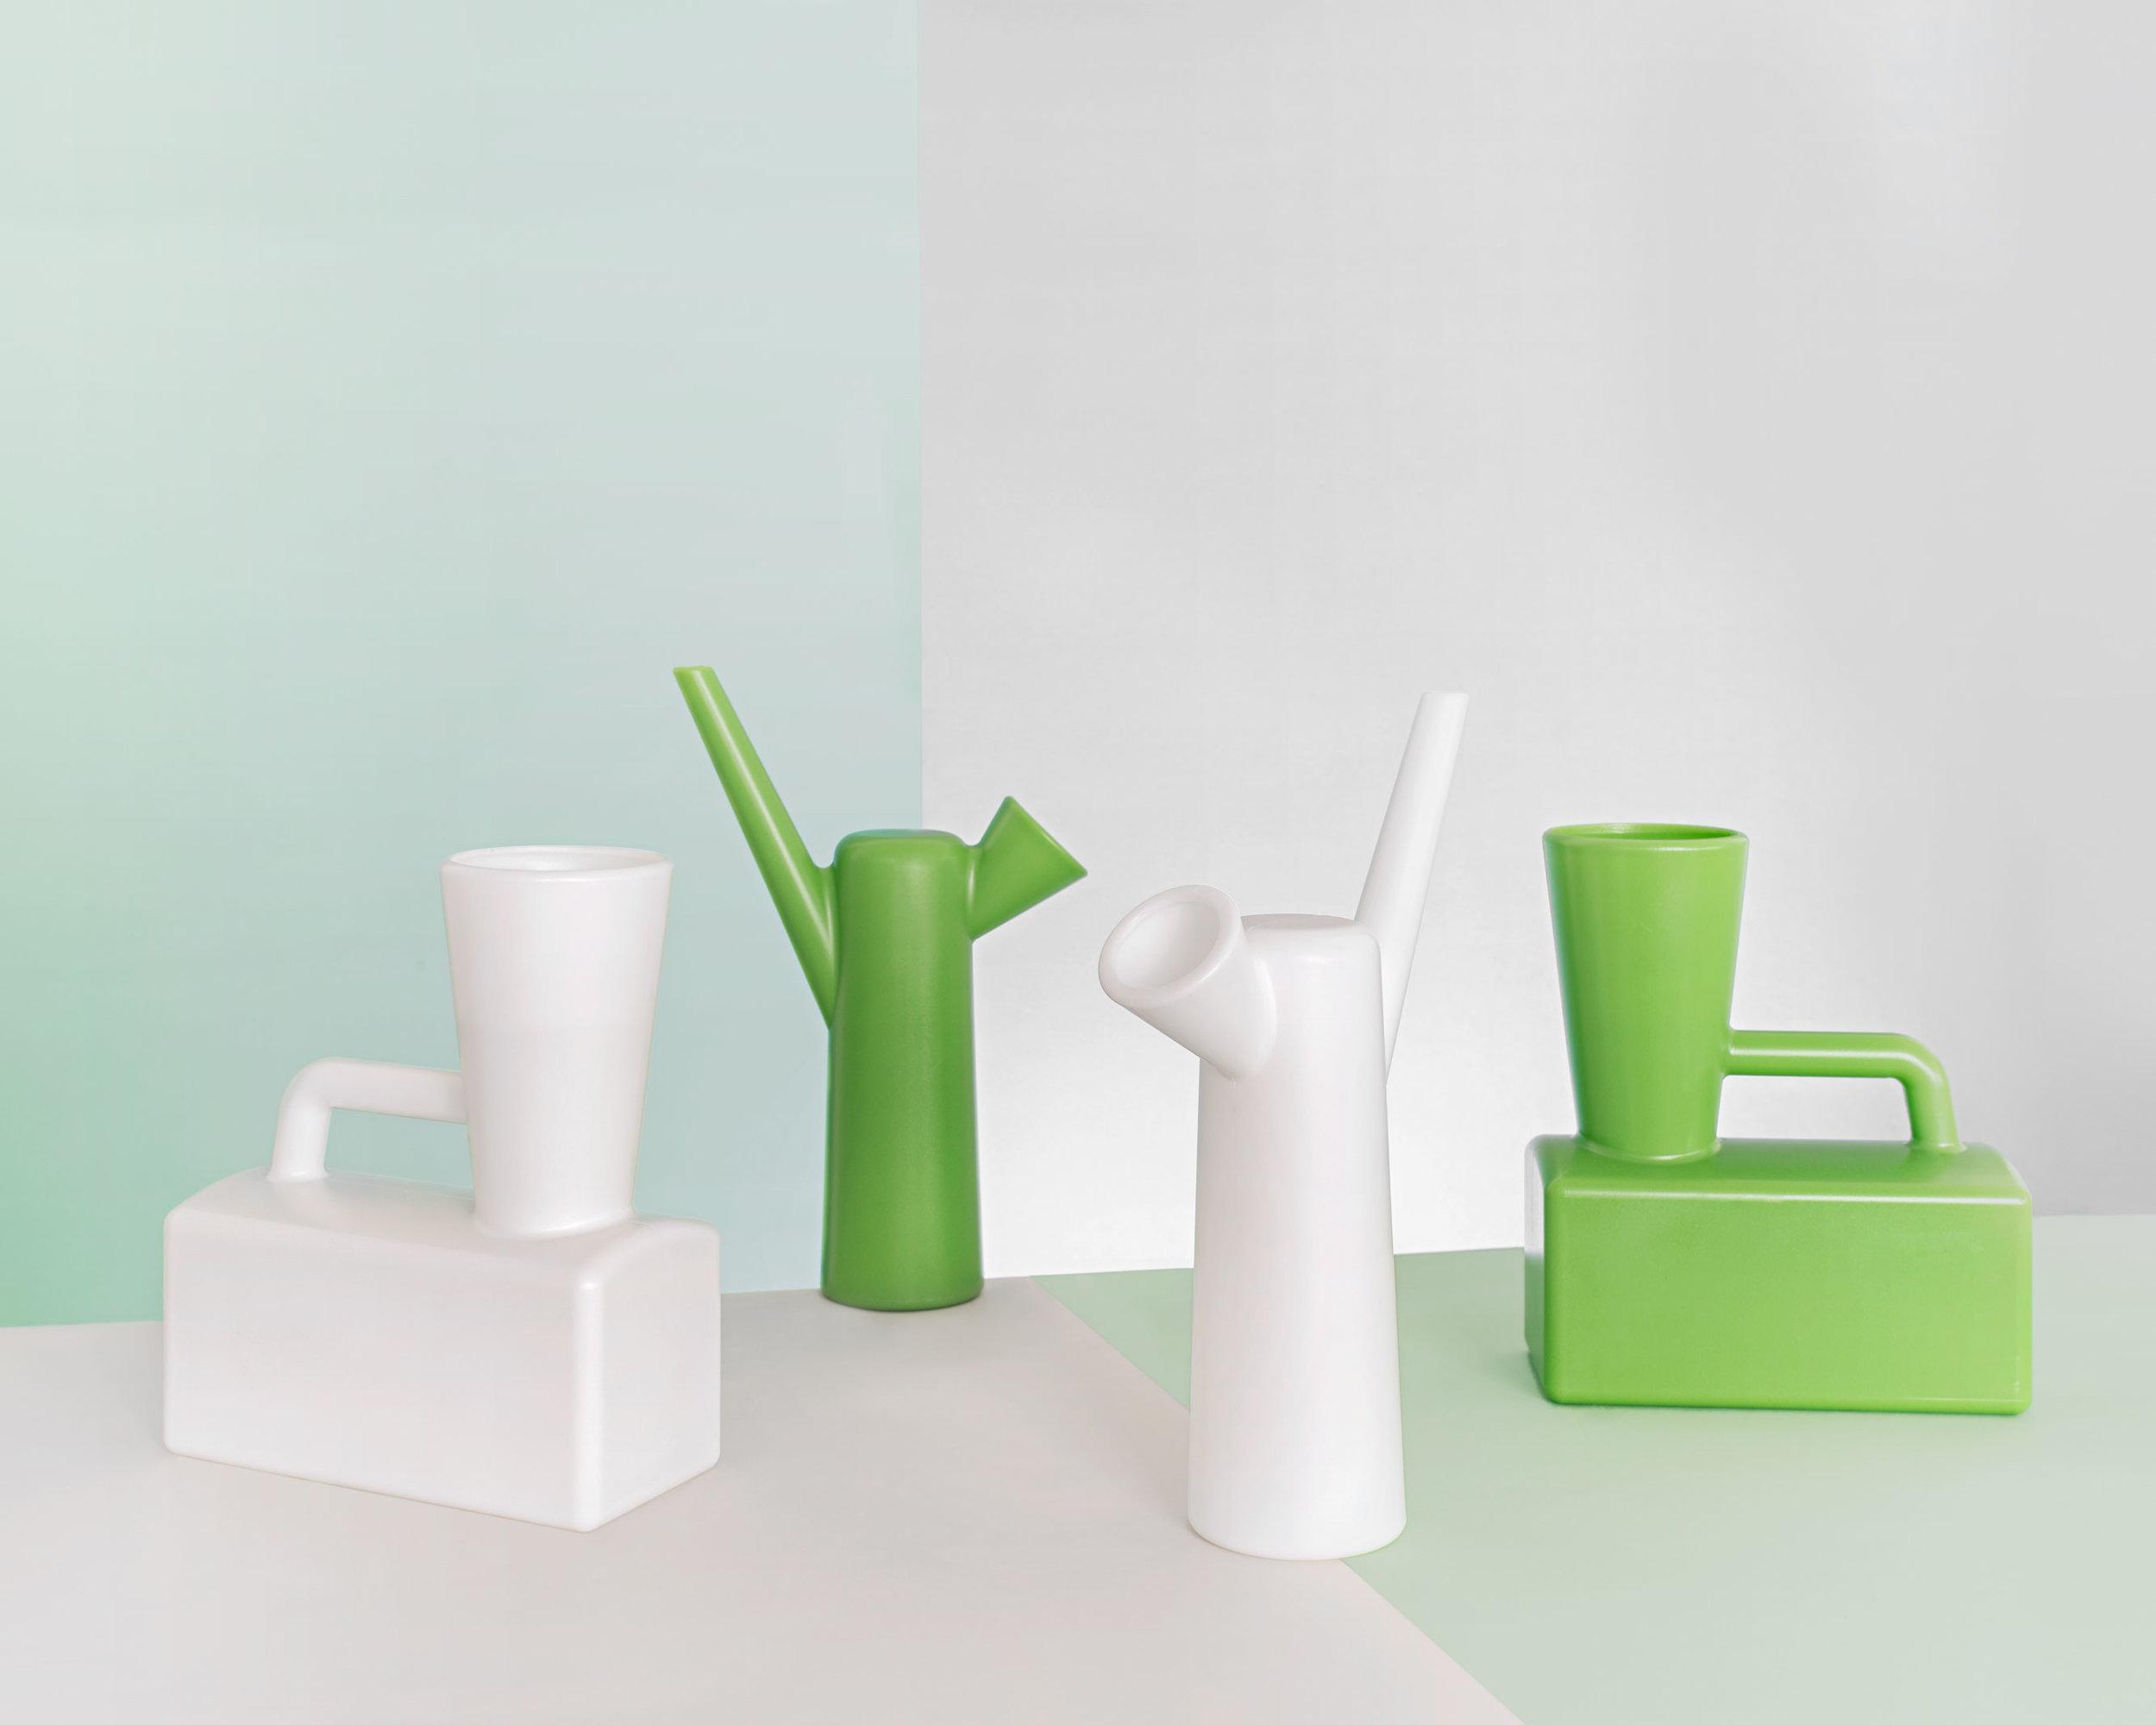 adrien-rovero-studio-lausanne-jardins-objects-1.jpg